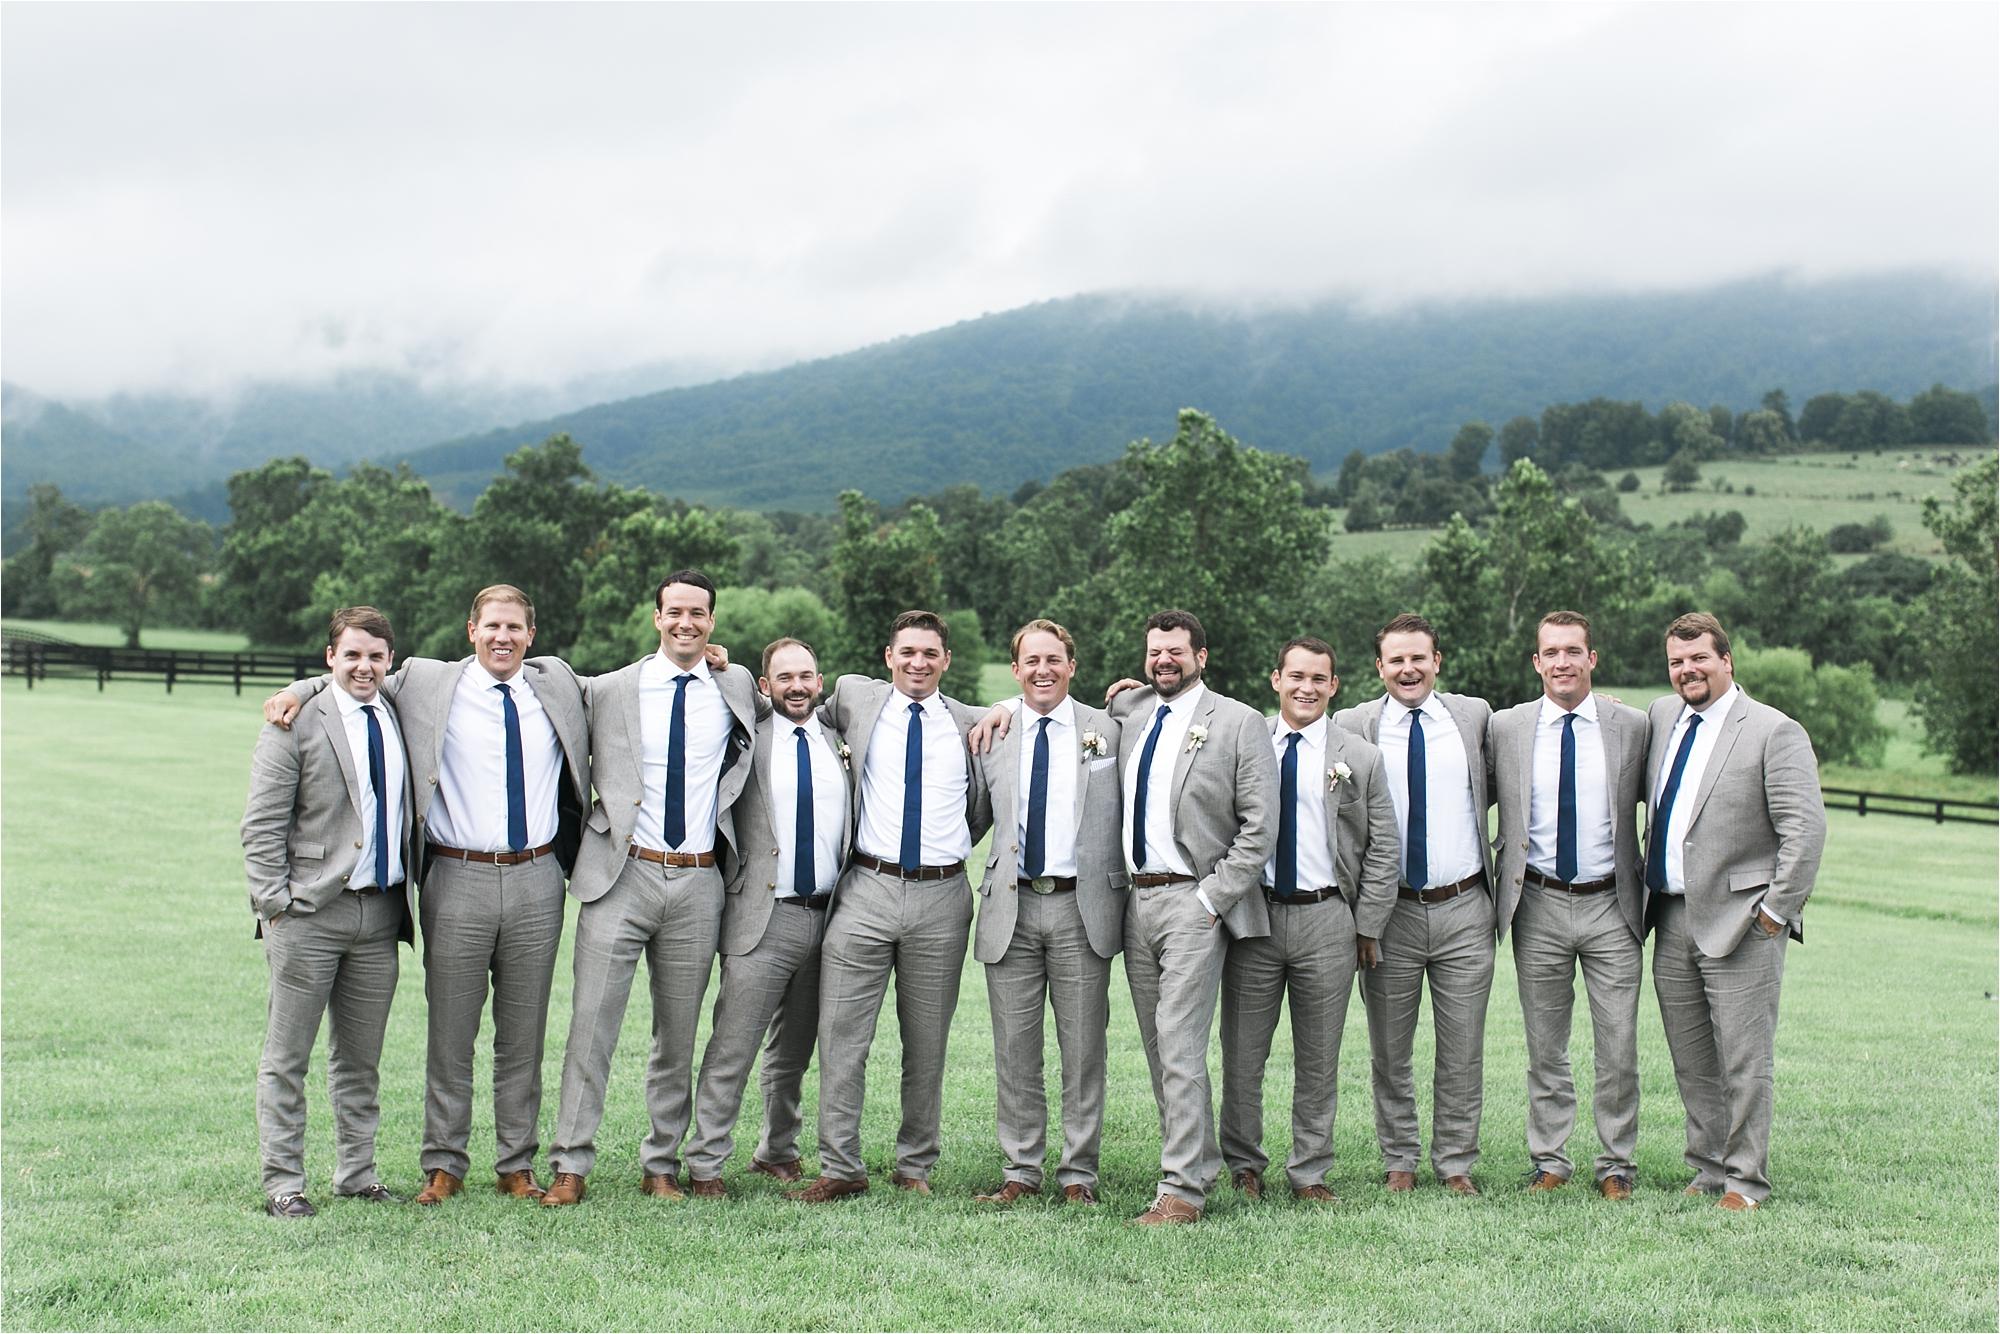 stephanie-yonce-charlottesville-virginia-king-family-vineyard-wedding-photos_0025.jpg